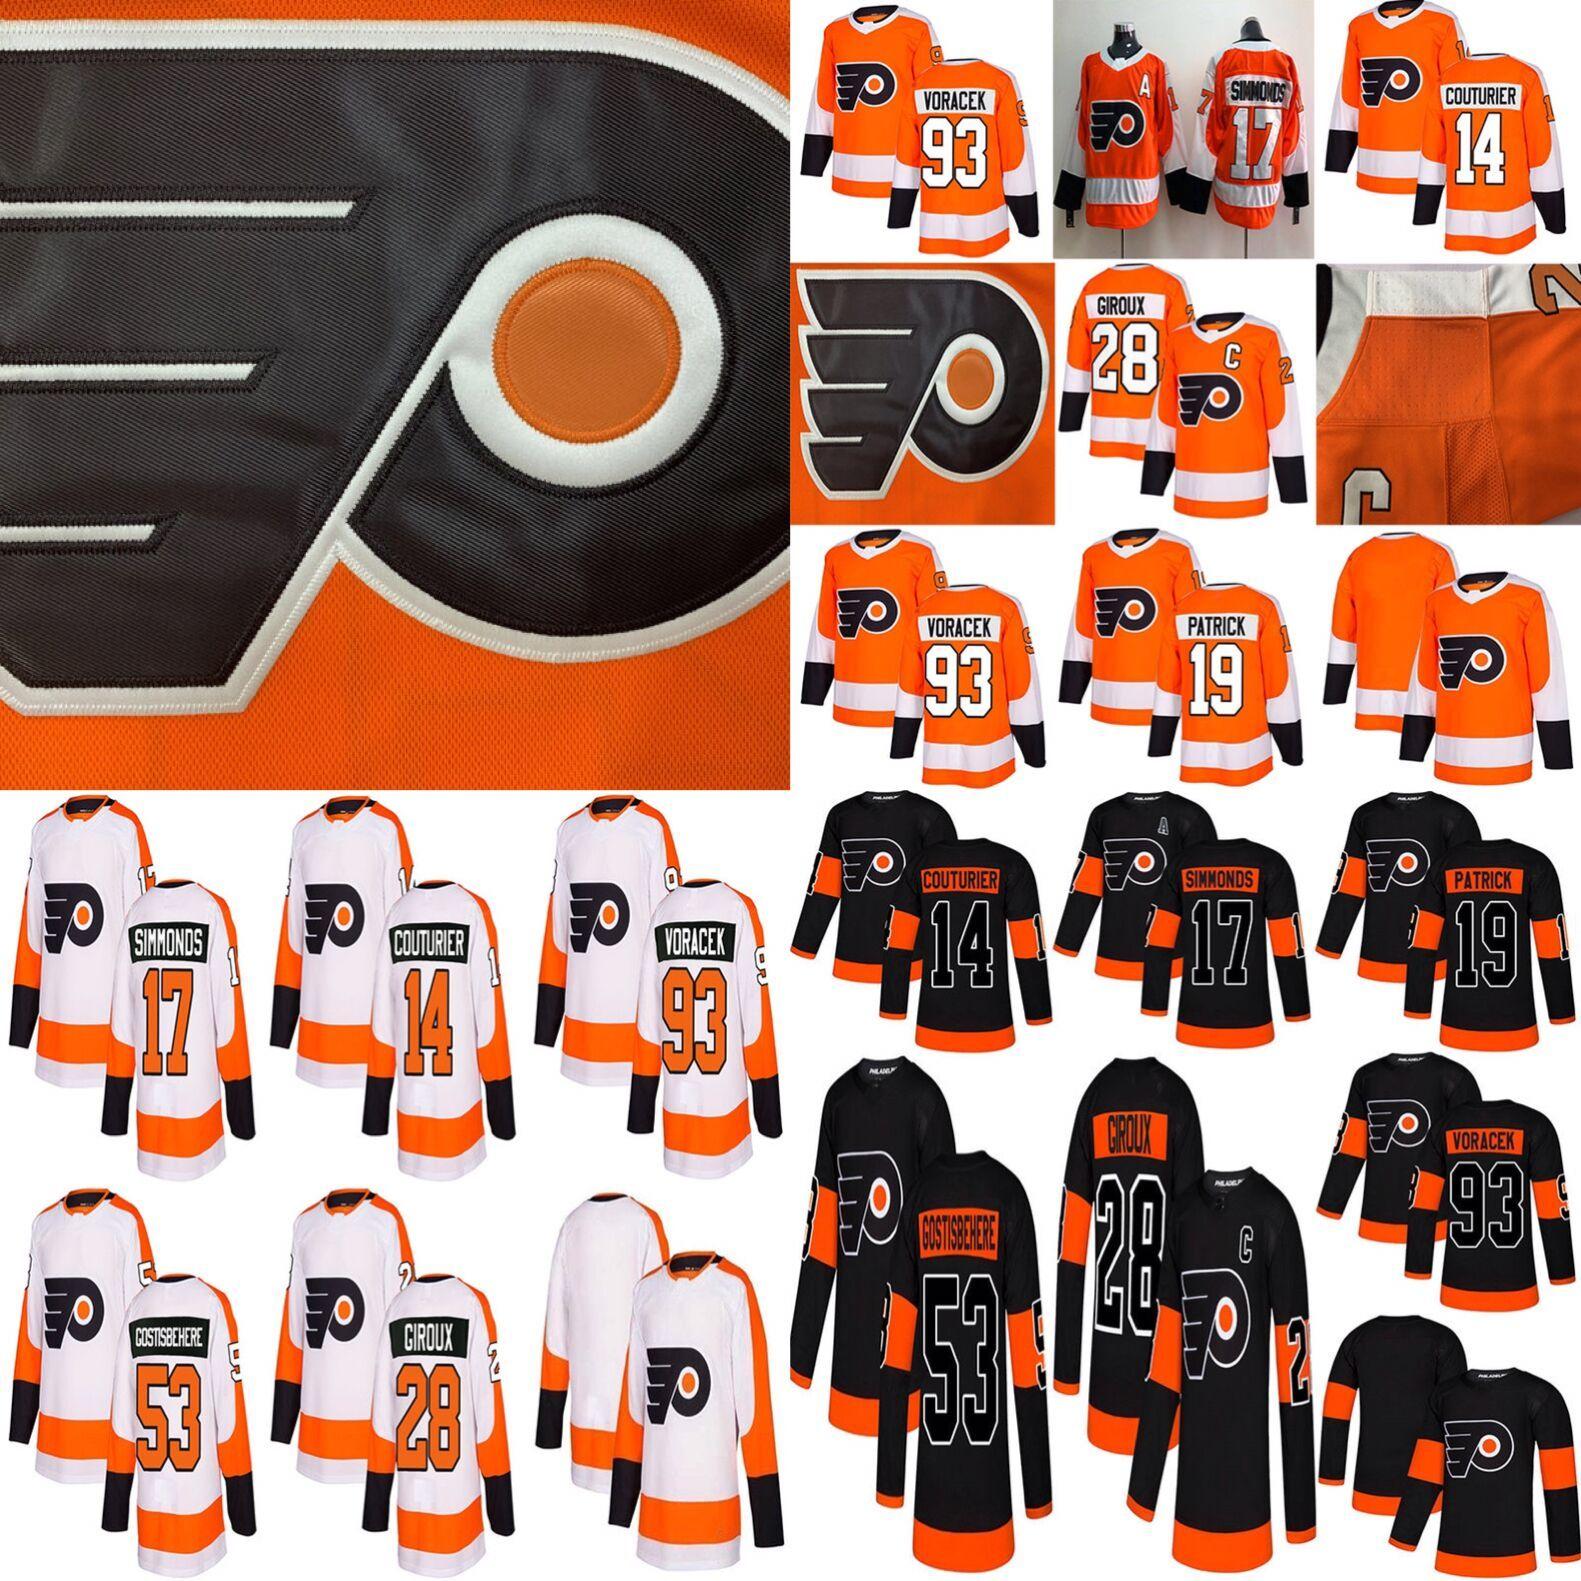 2019 Philadelphia Flyers Hockey 28 Claude Giroux 17 Wayne Simmonds 53  Gostisbehere 93 Voracek 19 Nolan Patrick 14 Sean Couturier Ice Hockey  Hockey Jerseys ... 57d0ec7b9